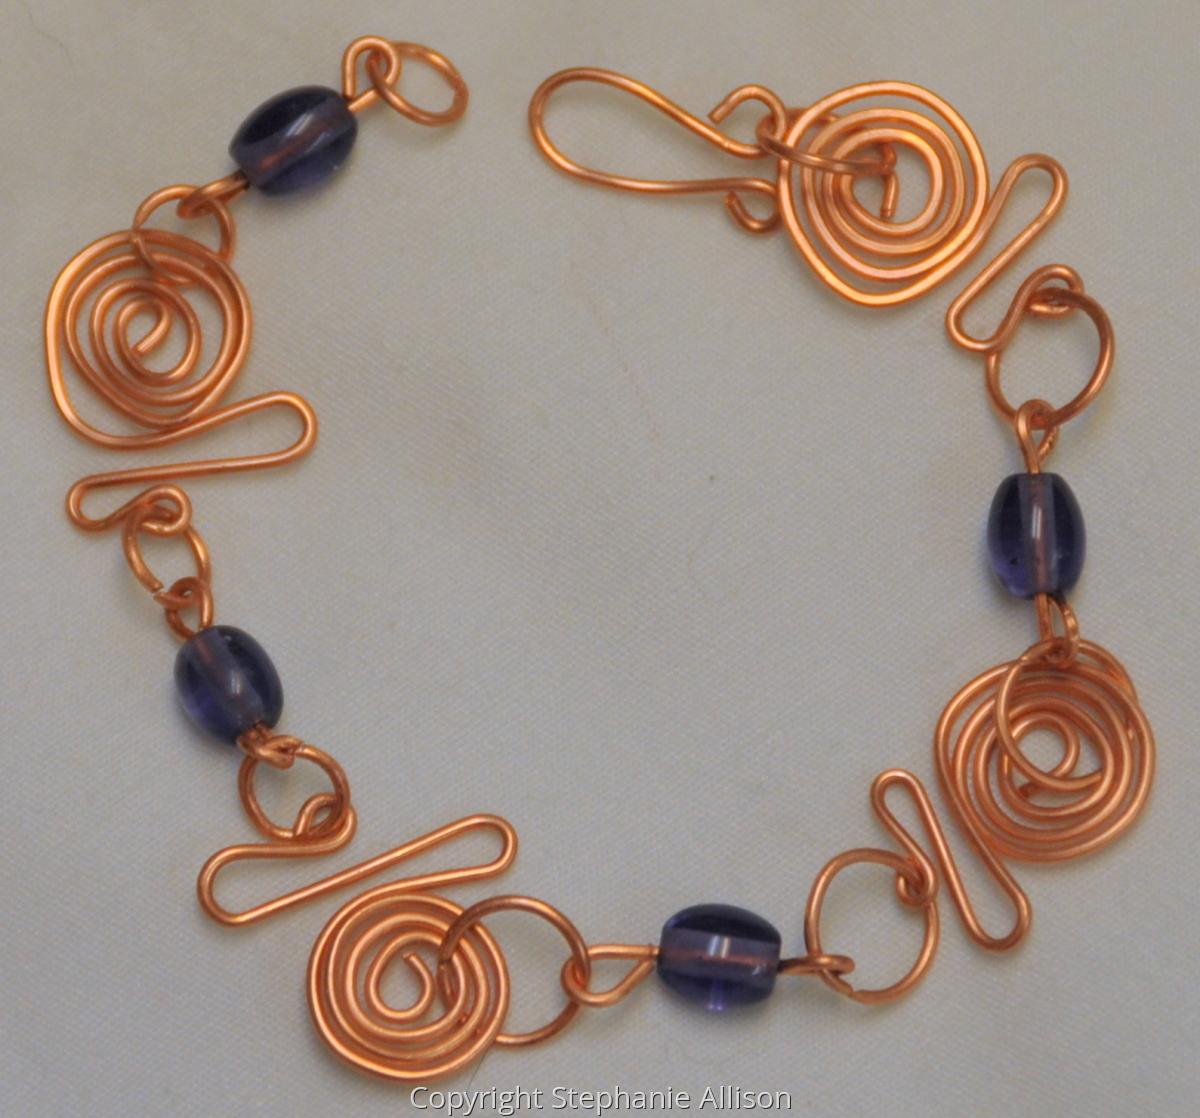 Bracelet, Copper & Purple Beads (large view)